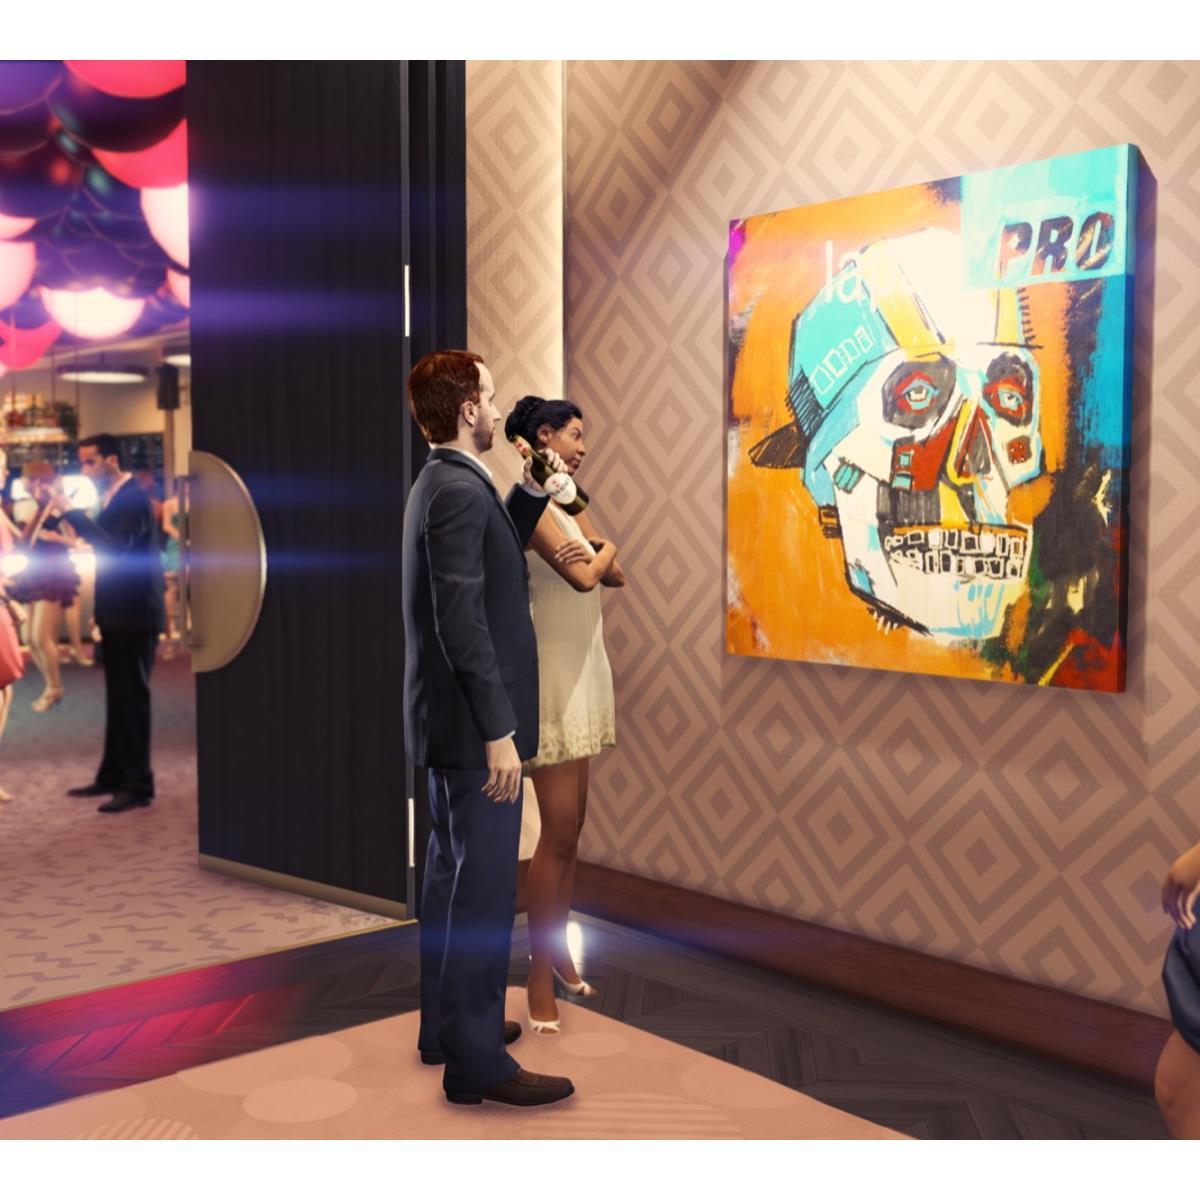 GTA Online Diamond Casino & Resort Grand Opening Stacks Deck With